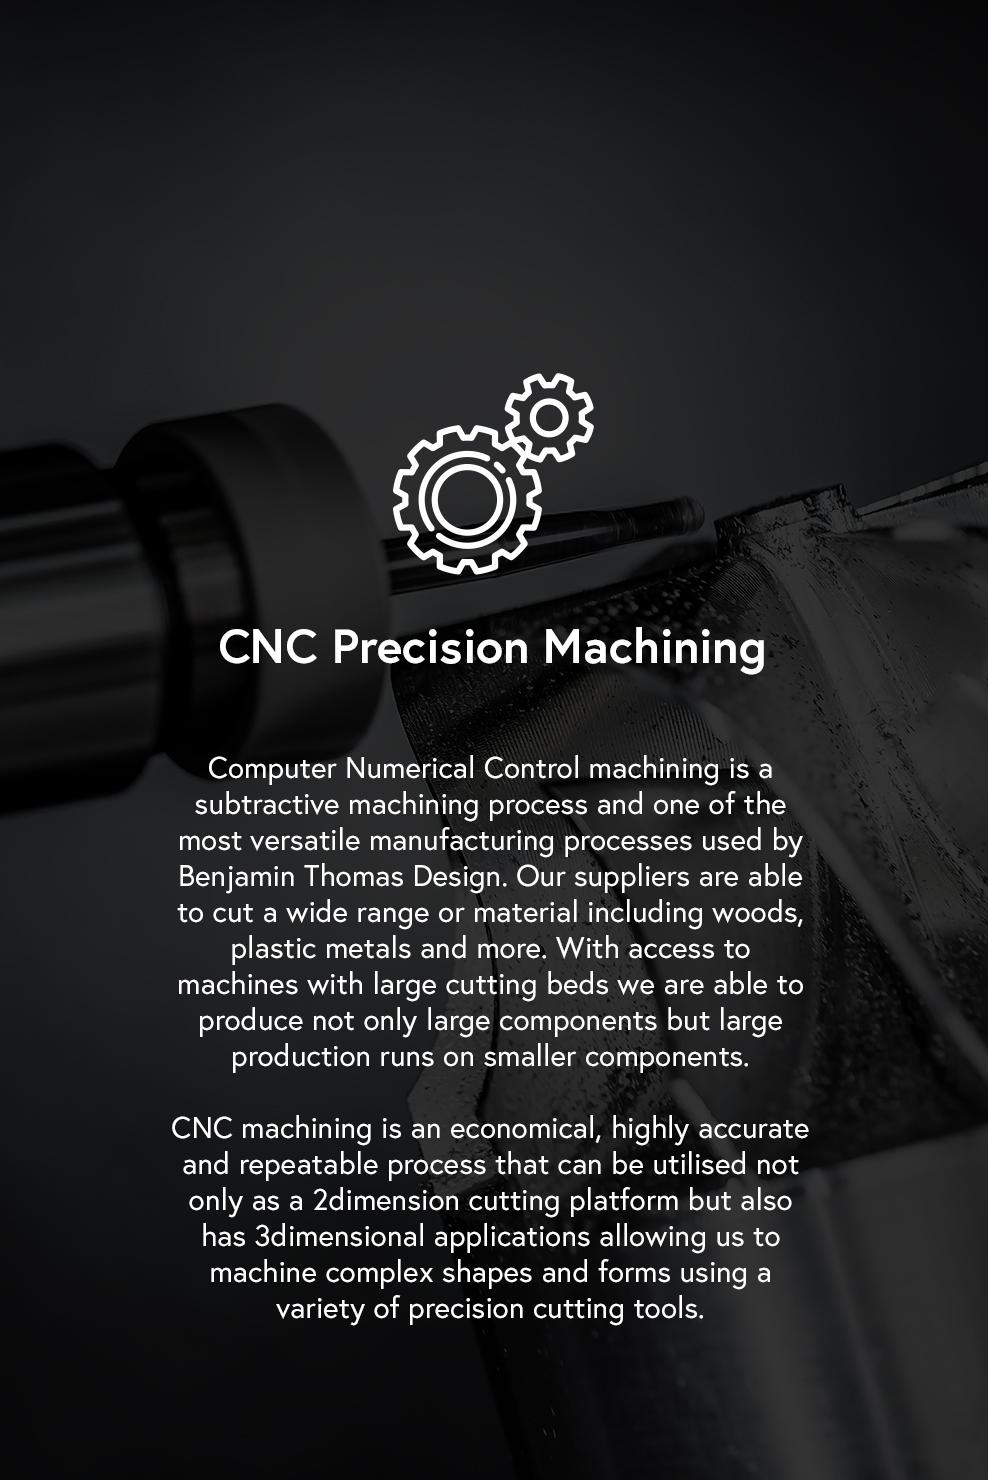 cnc-precision.jpg